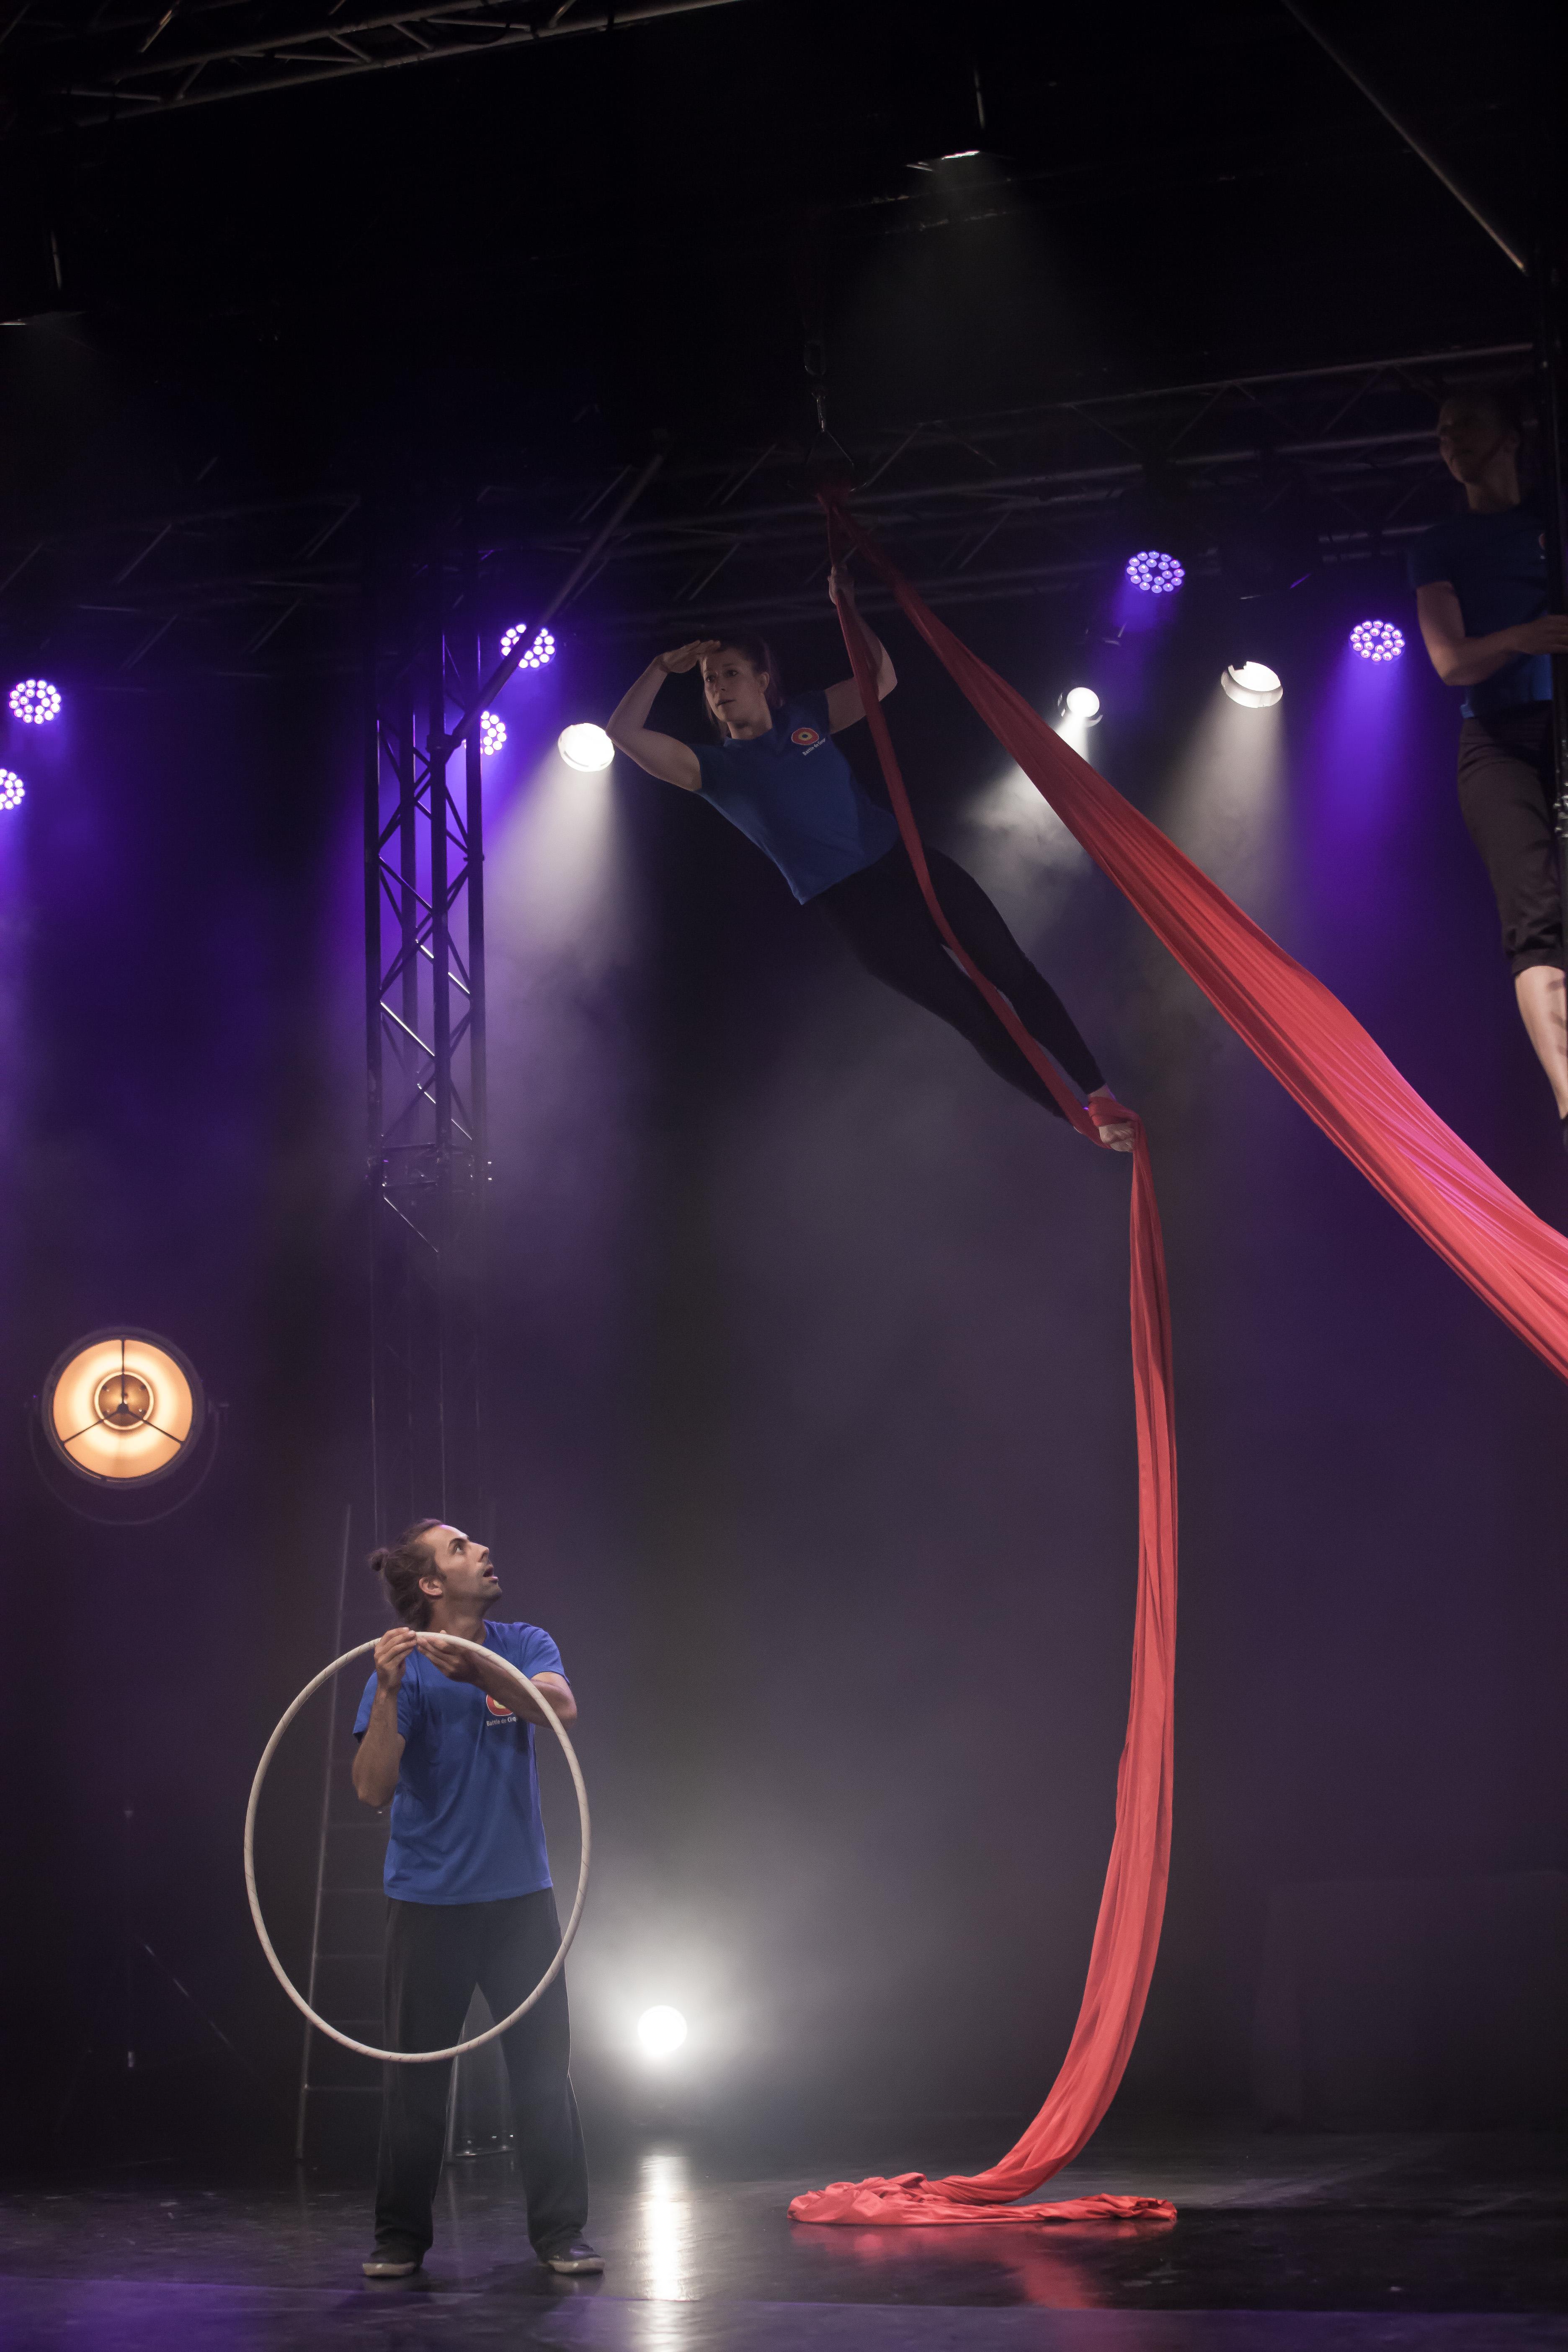 170701-battle-cirque-jdufresne-25_35834418965_o